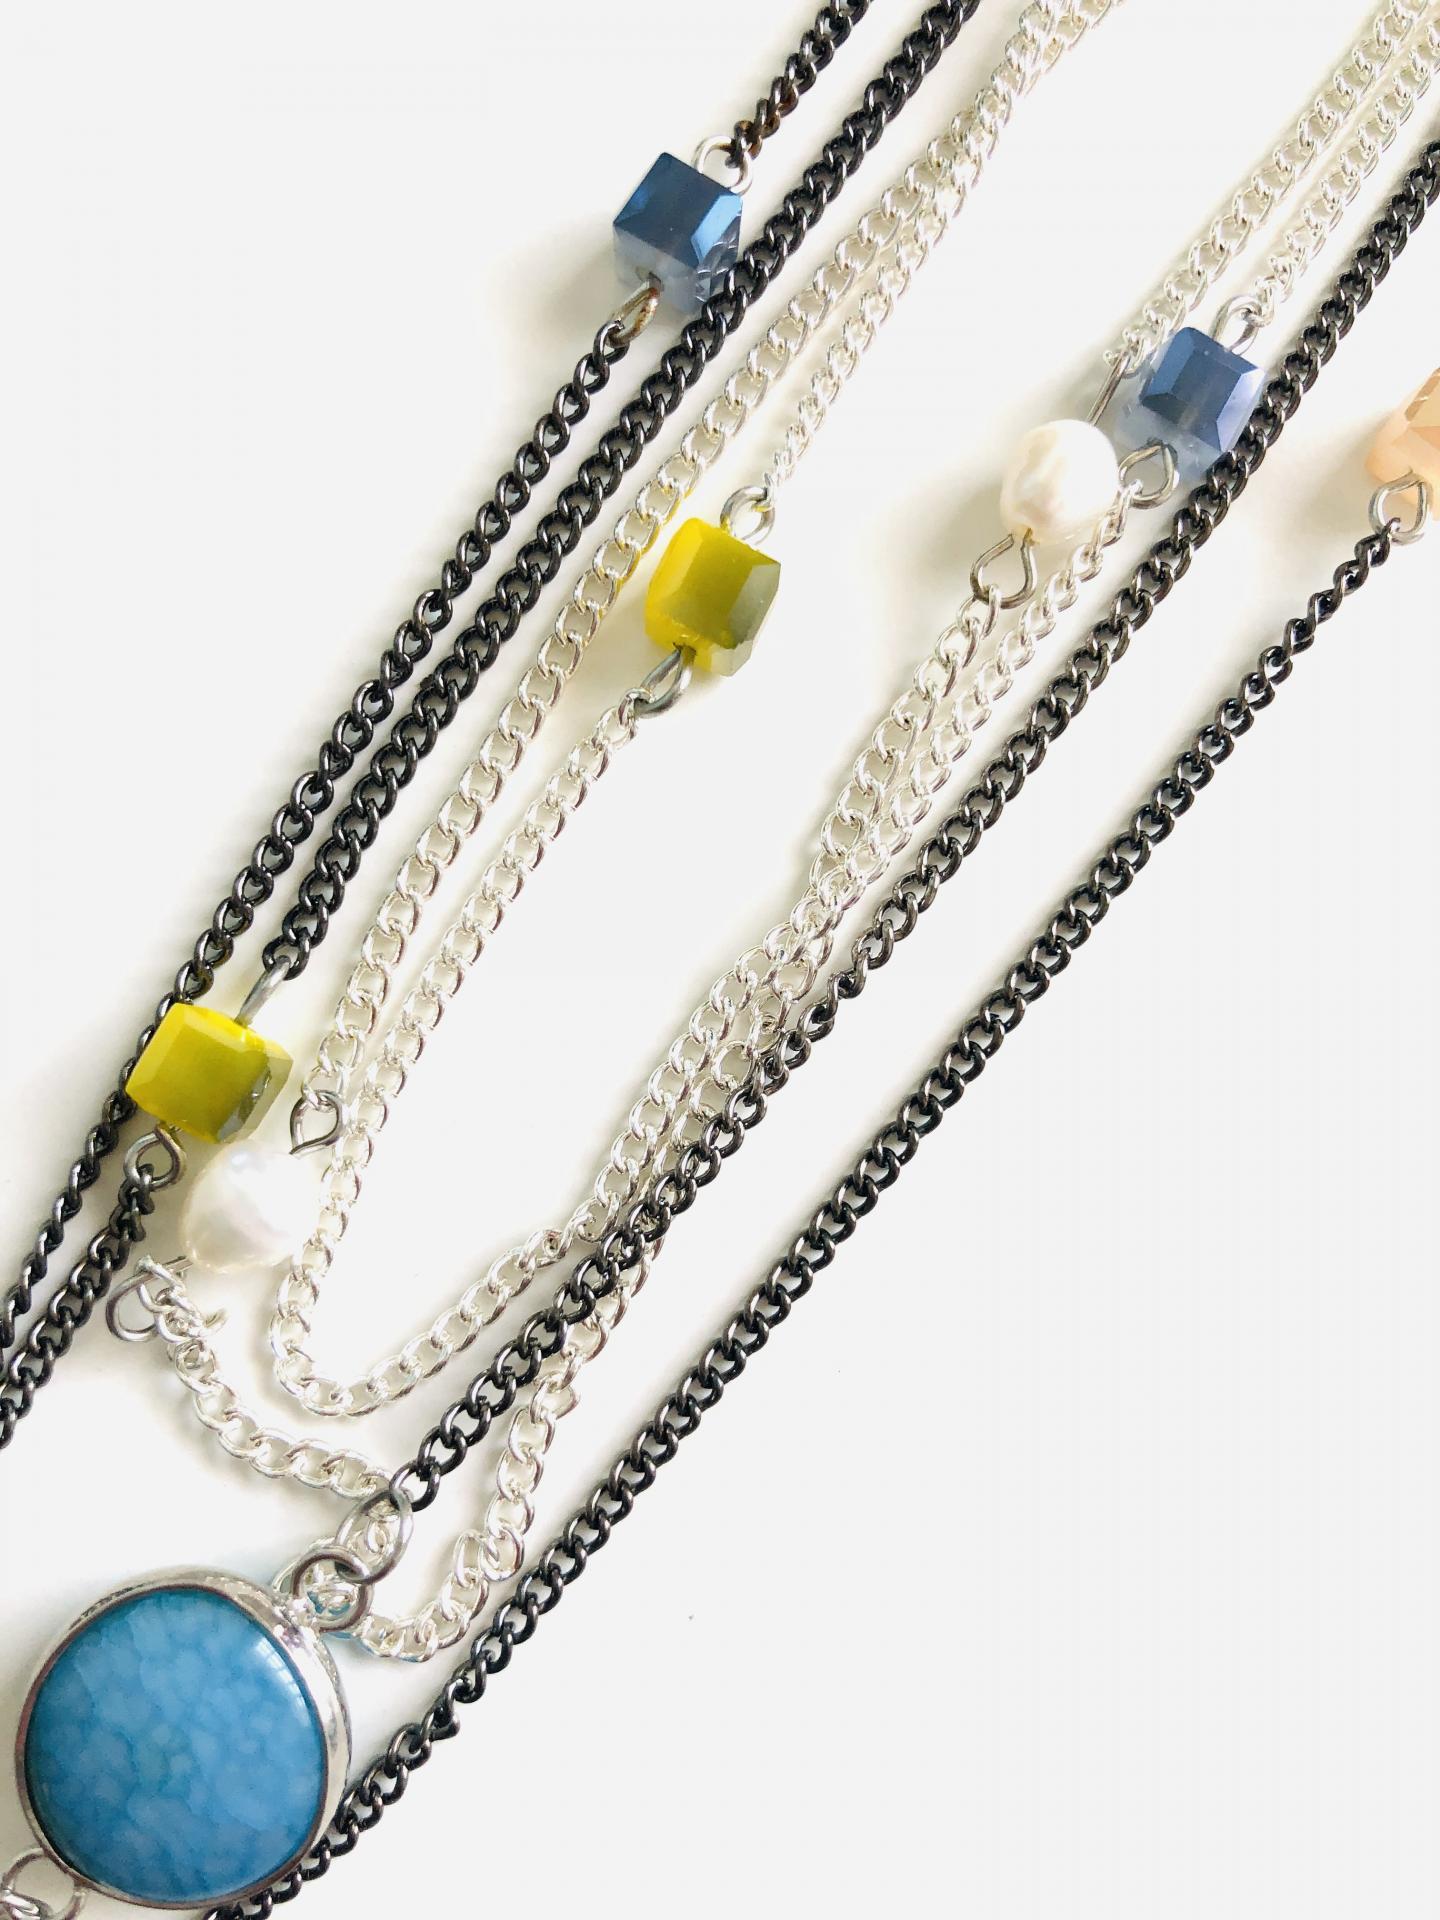 Collar fantasía cadenas azul turquesa